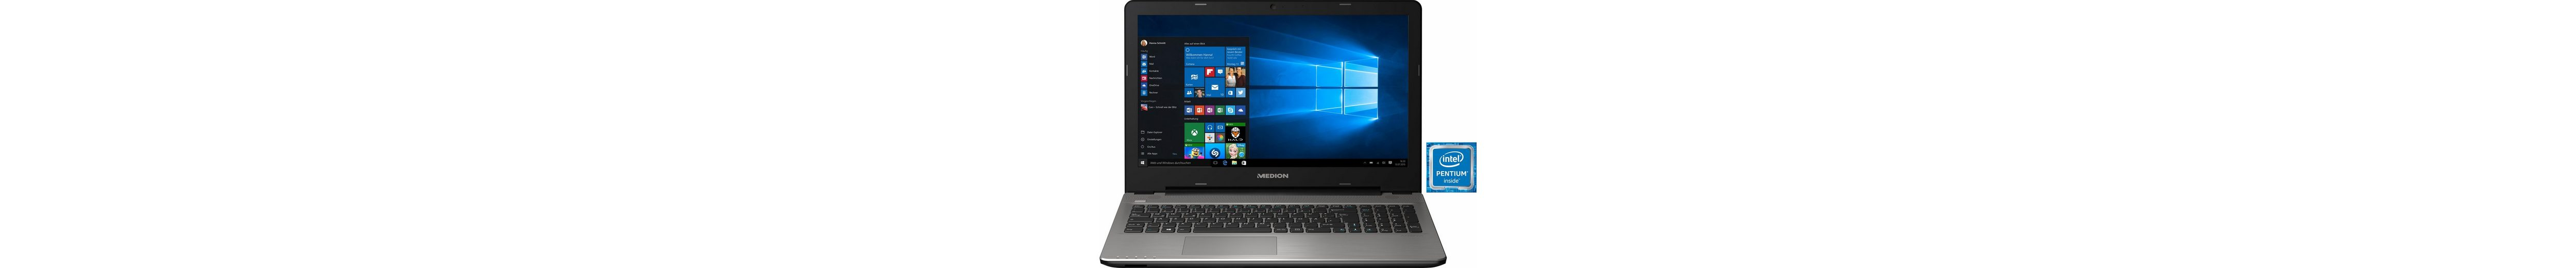 Medion® Akoya E6421 Notebook, Intel® Pentium™, 39,6 cm (15,6 Zoll), 1128 GB Speicher, 8192 MB DDR3L